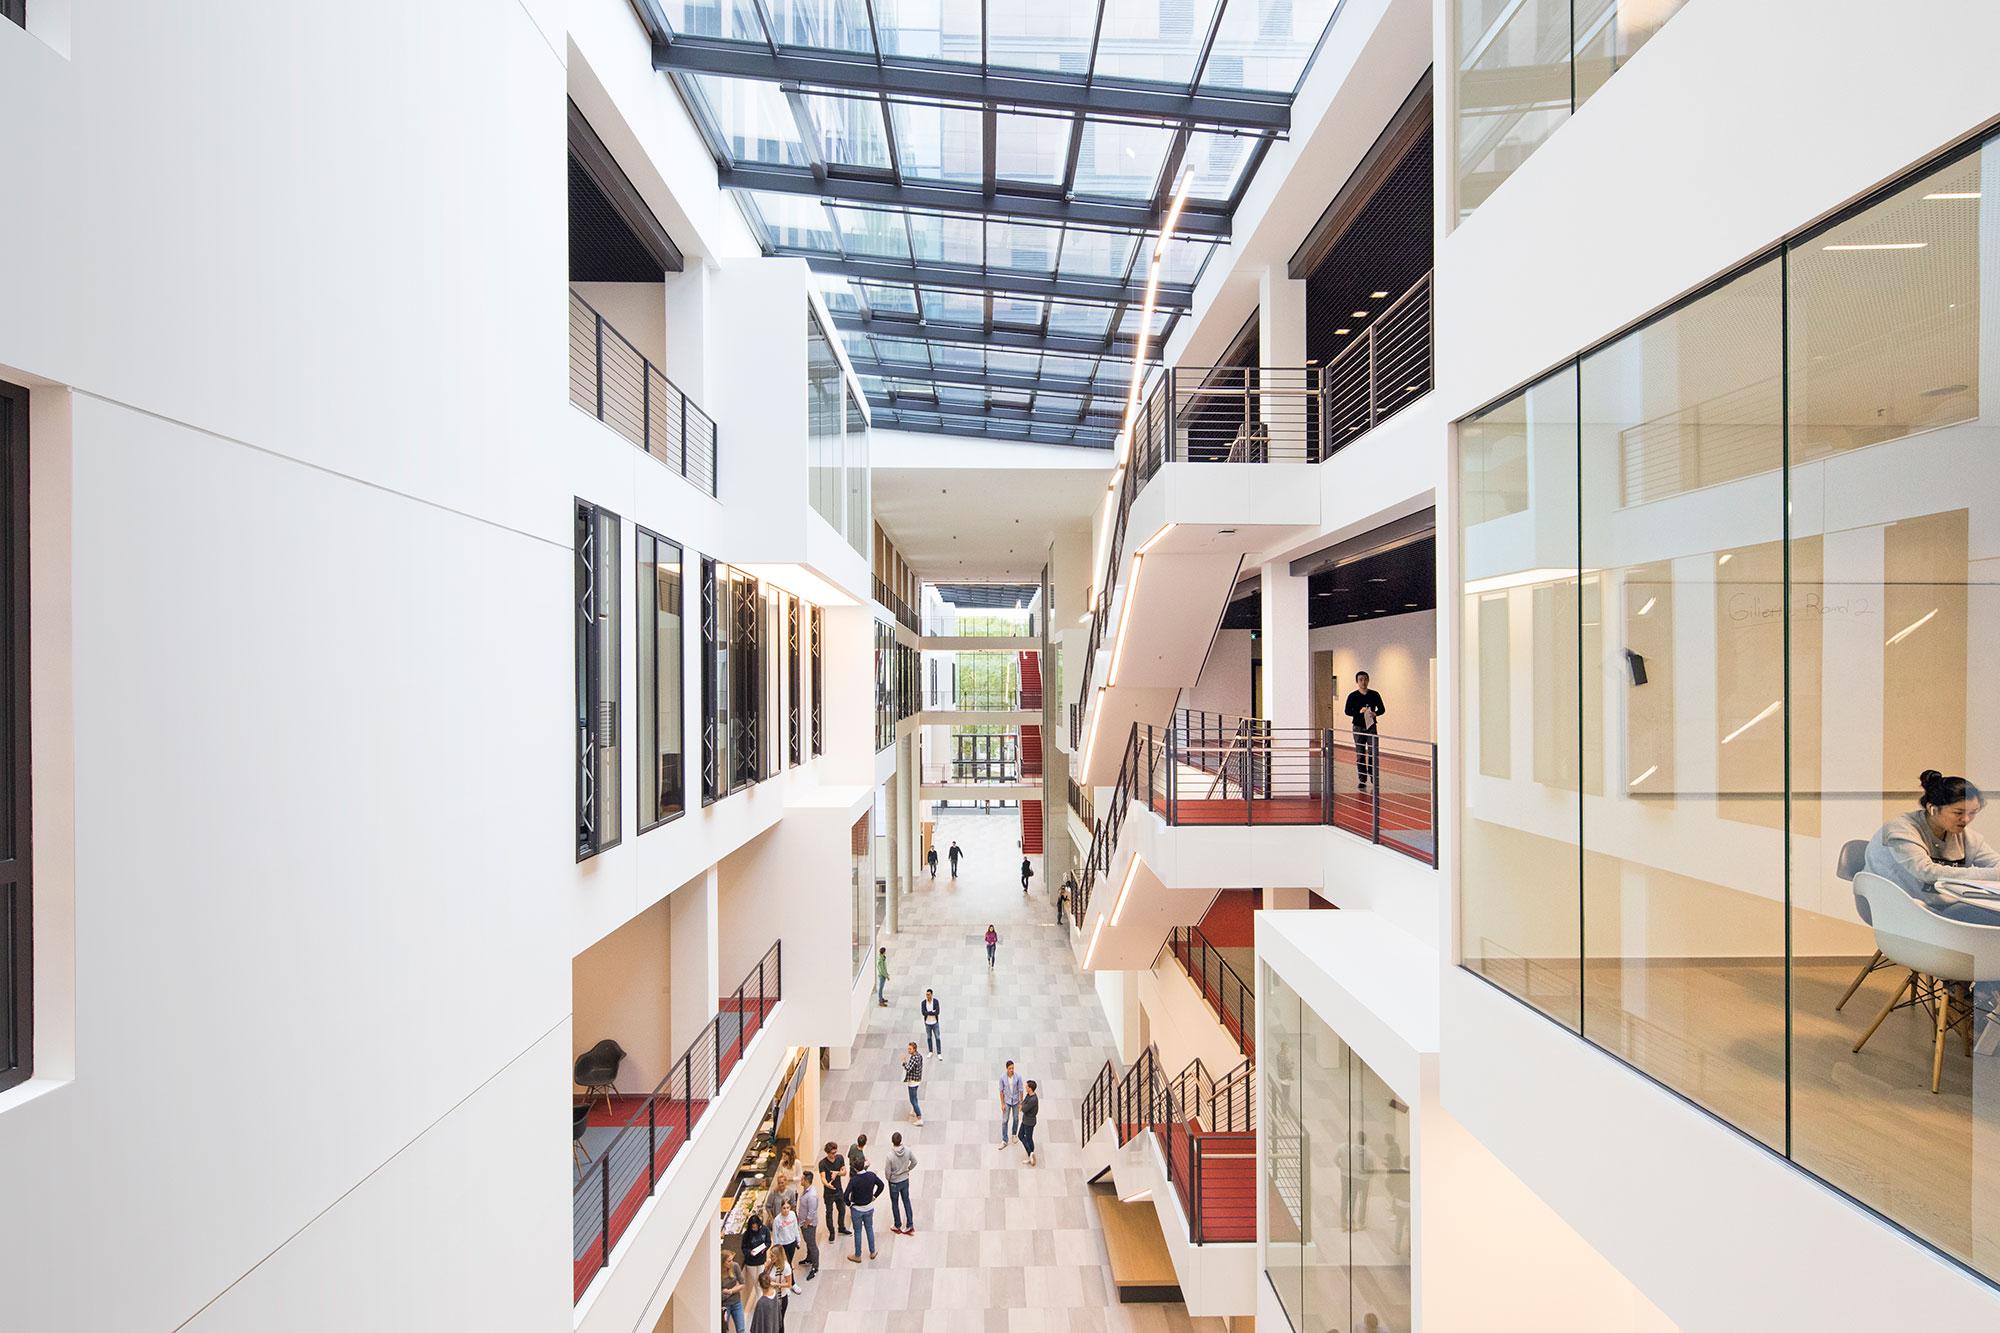 Frankfurt School of Finance & Management, Frankfurt am Main (architect: Henning Larsen)